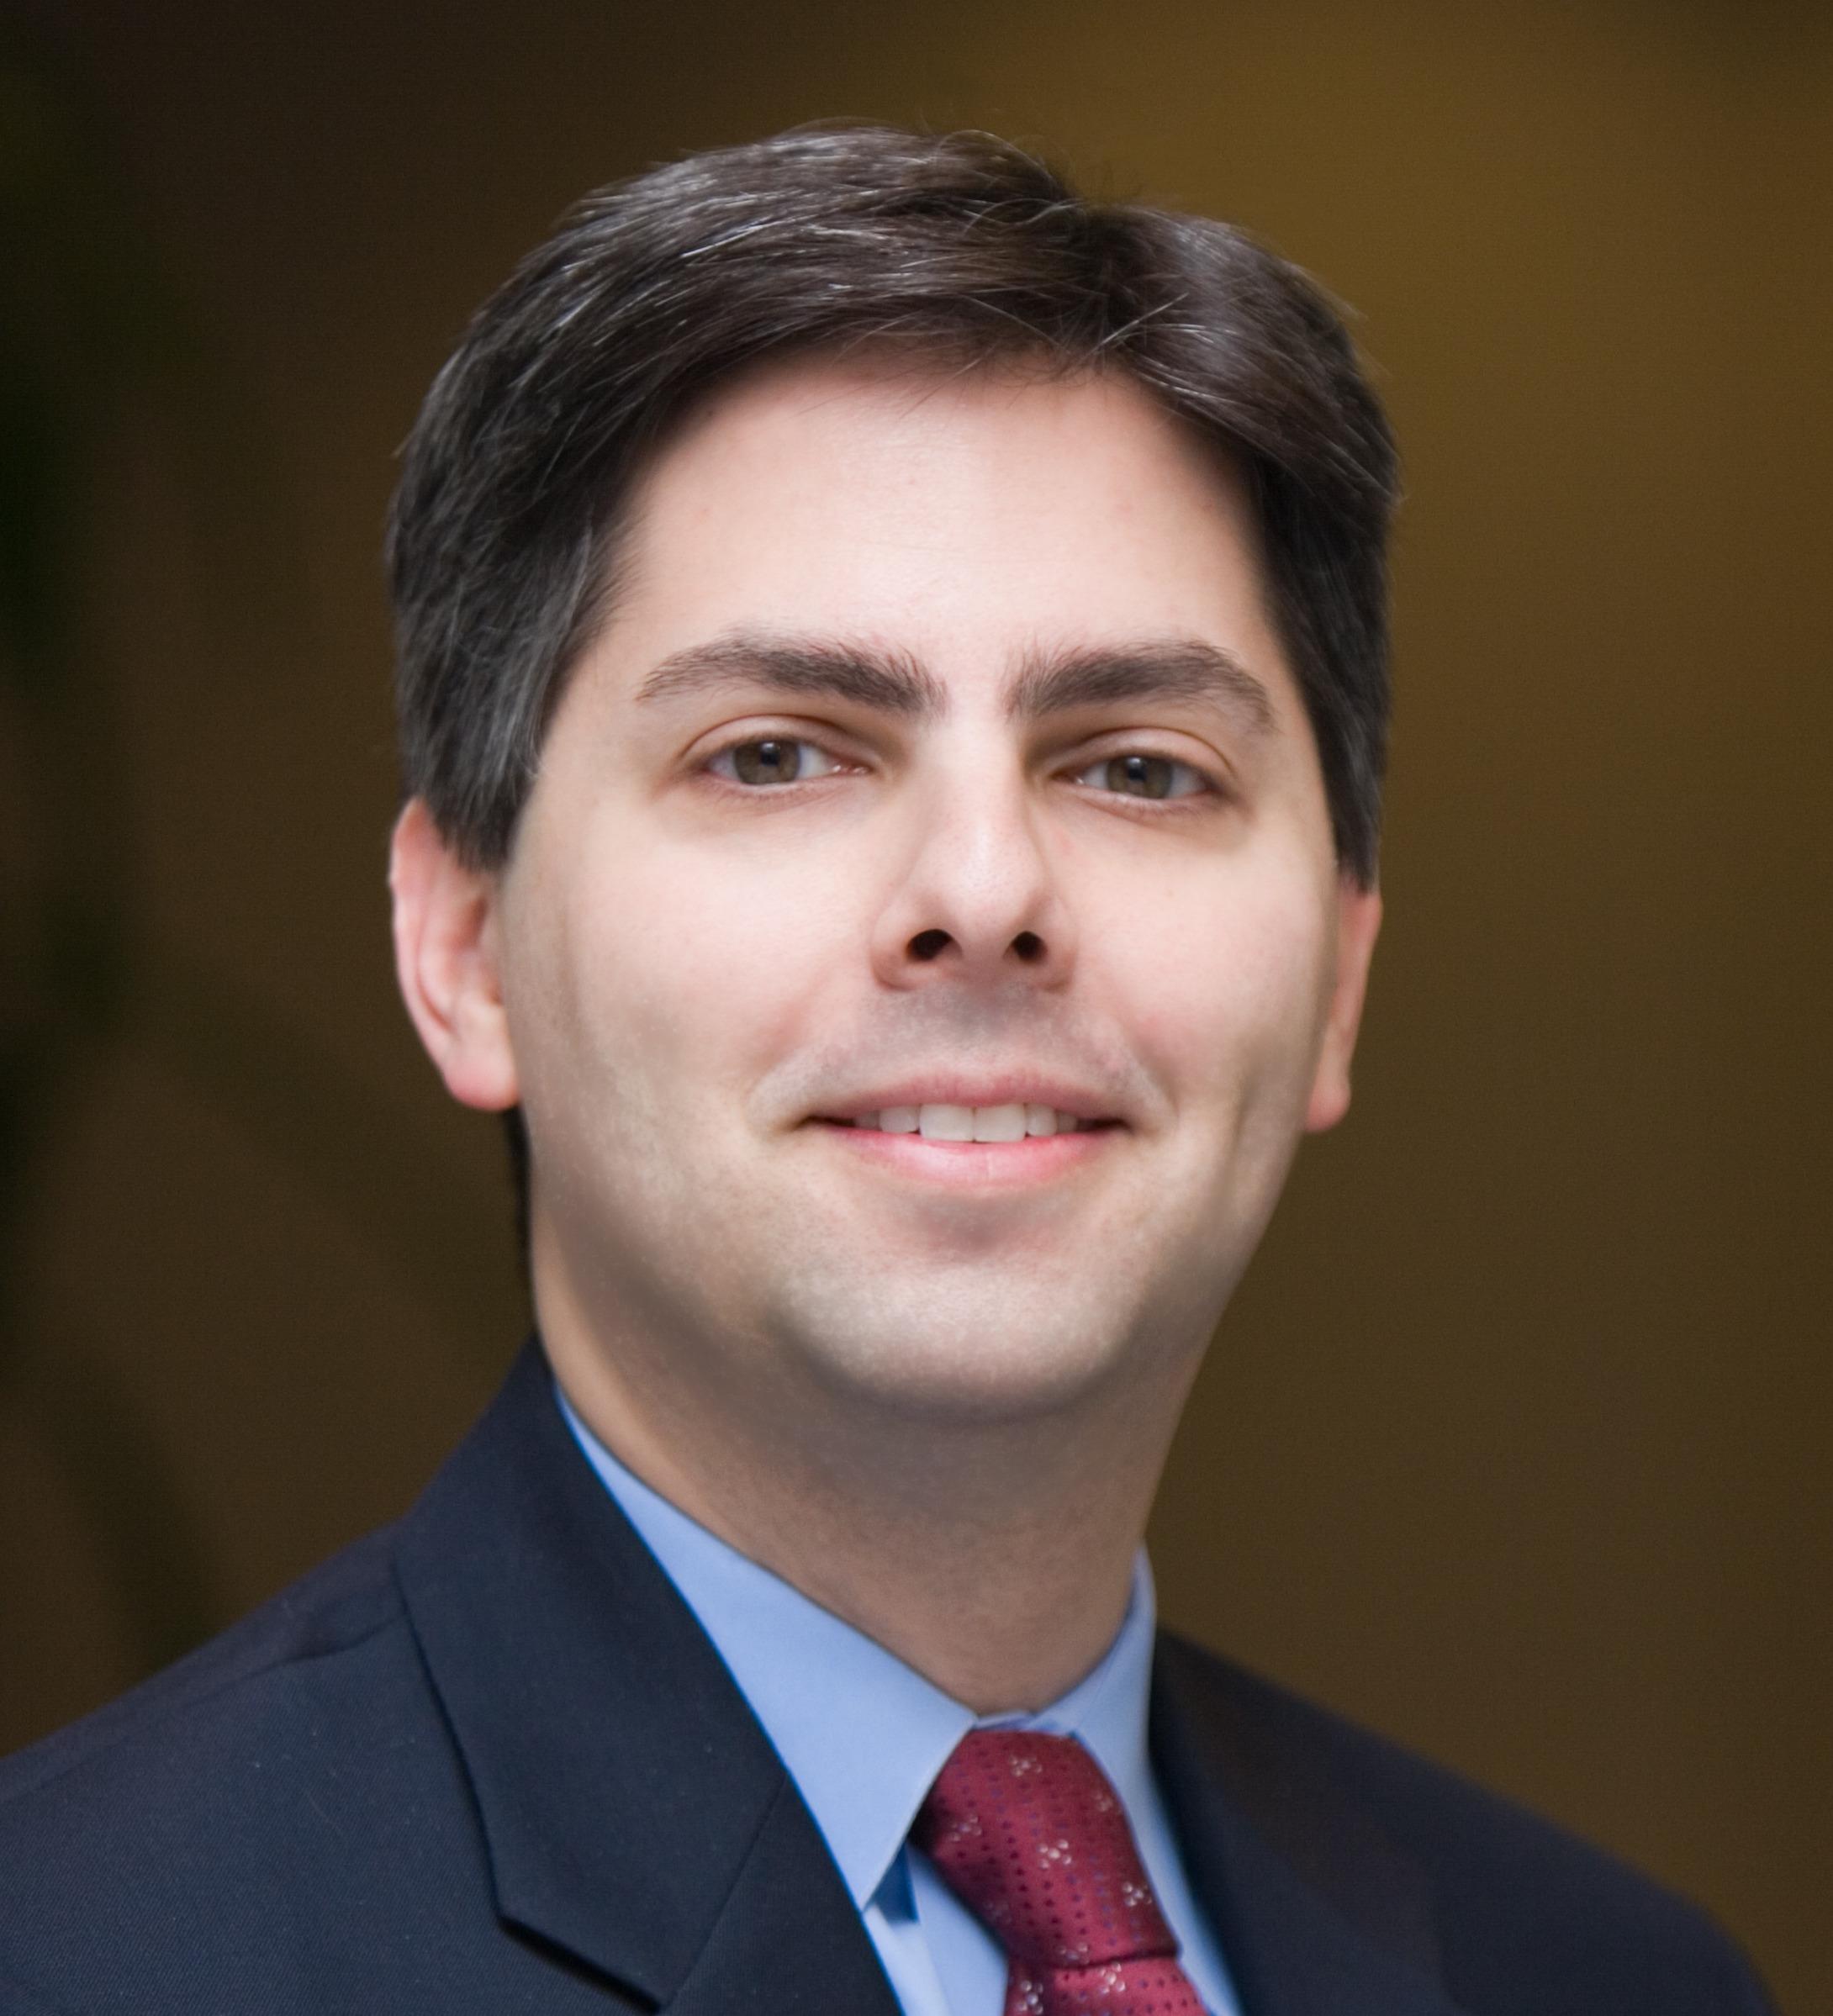 Jonathan Ian Nirenberg